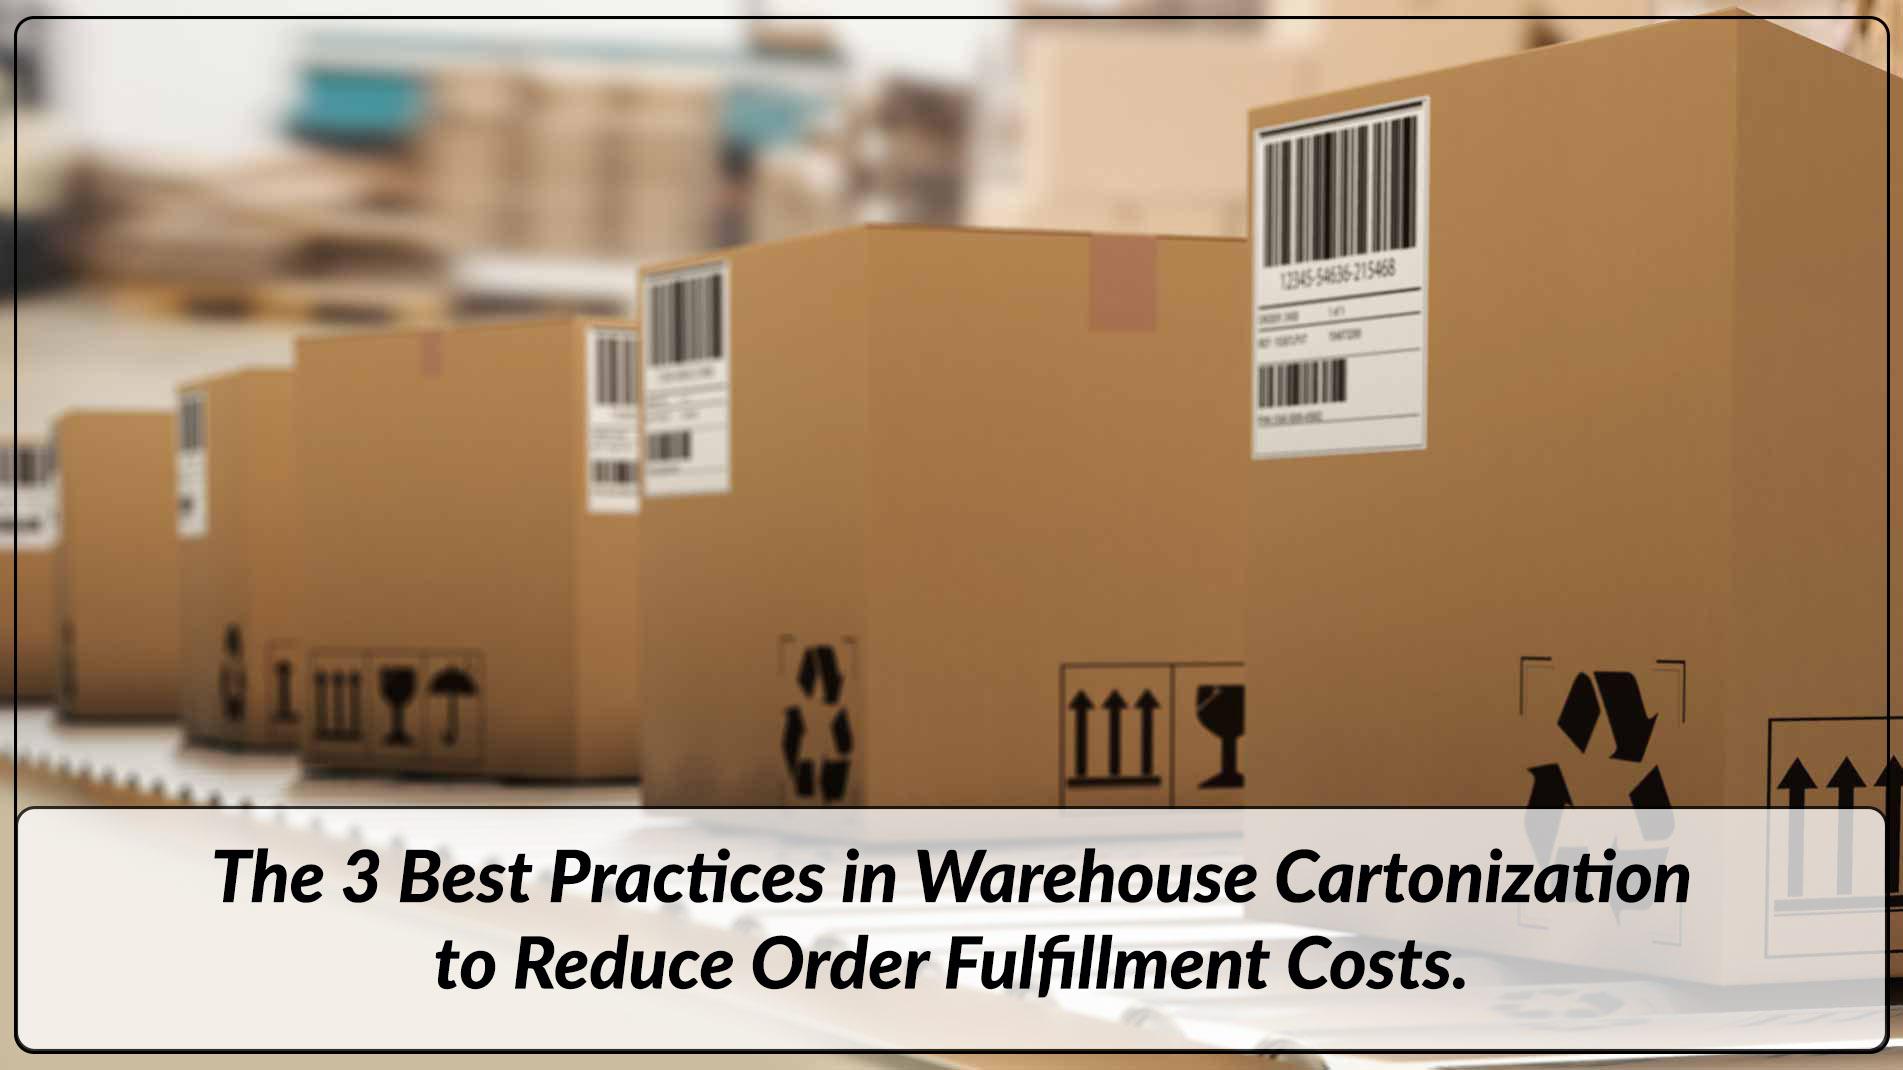 cartonization-best-practices